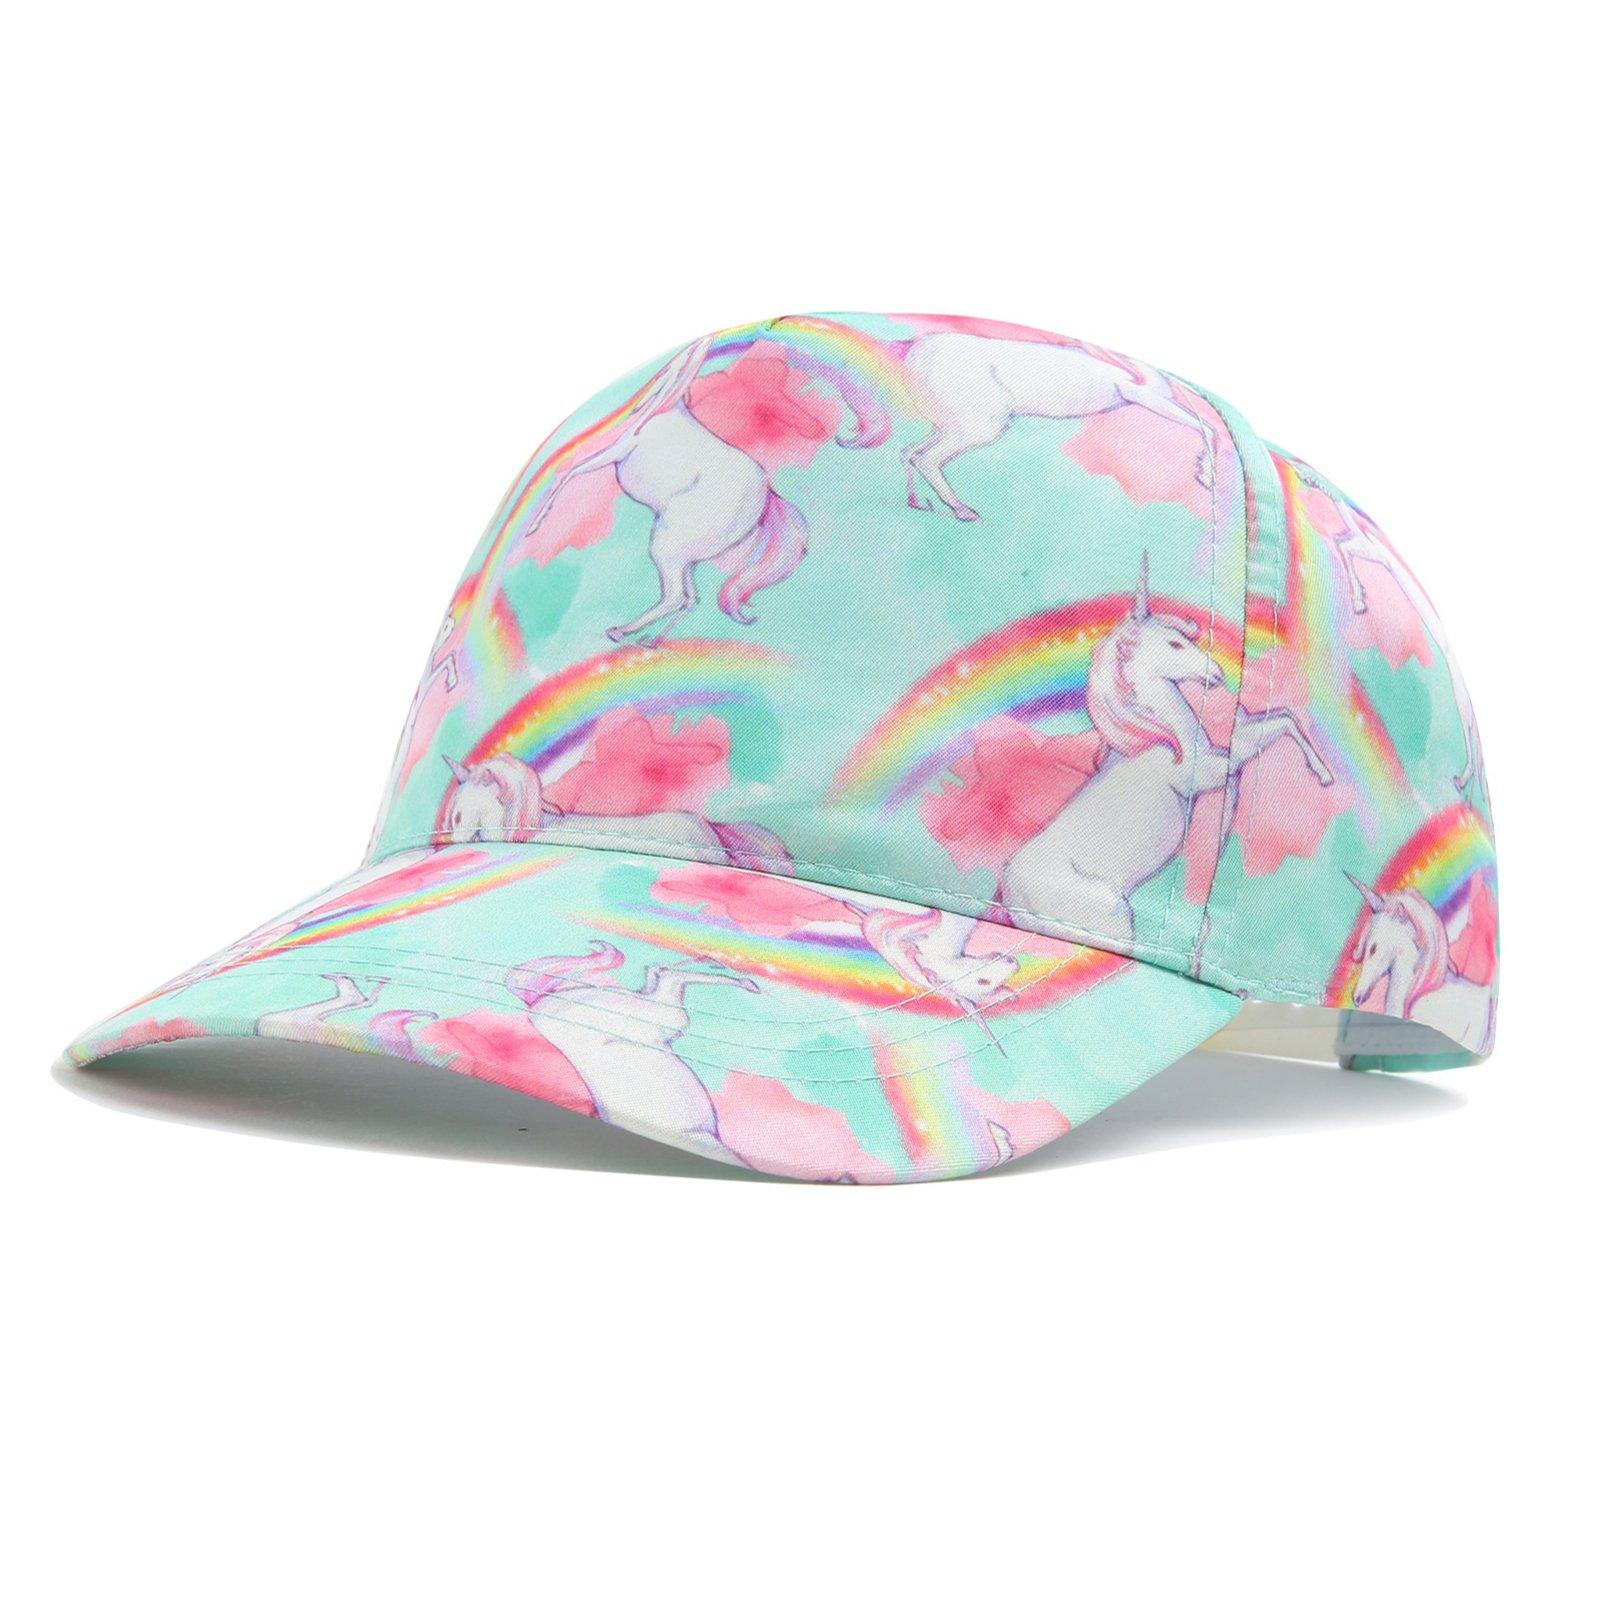 Liliane Kids hat Beach Hats for Kids Sun Hats for Girls hat Kids Hats for Girls Girls Baseball Cap(3-7 Years A044)